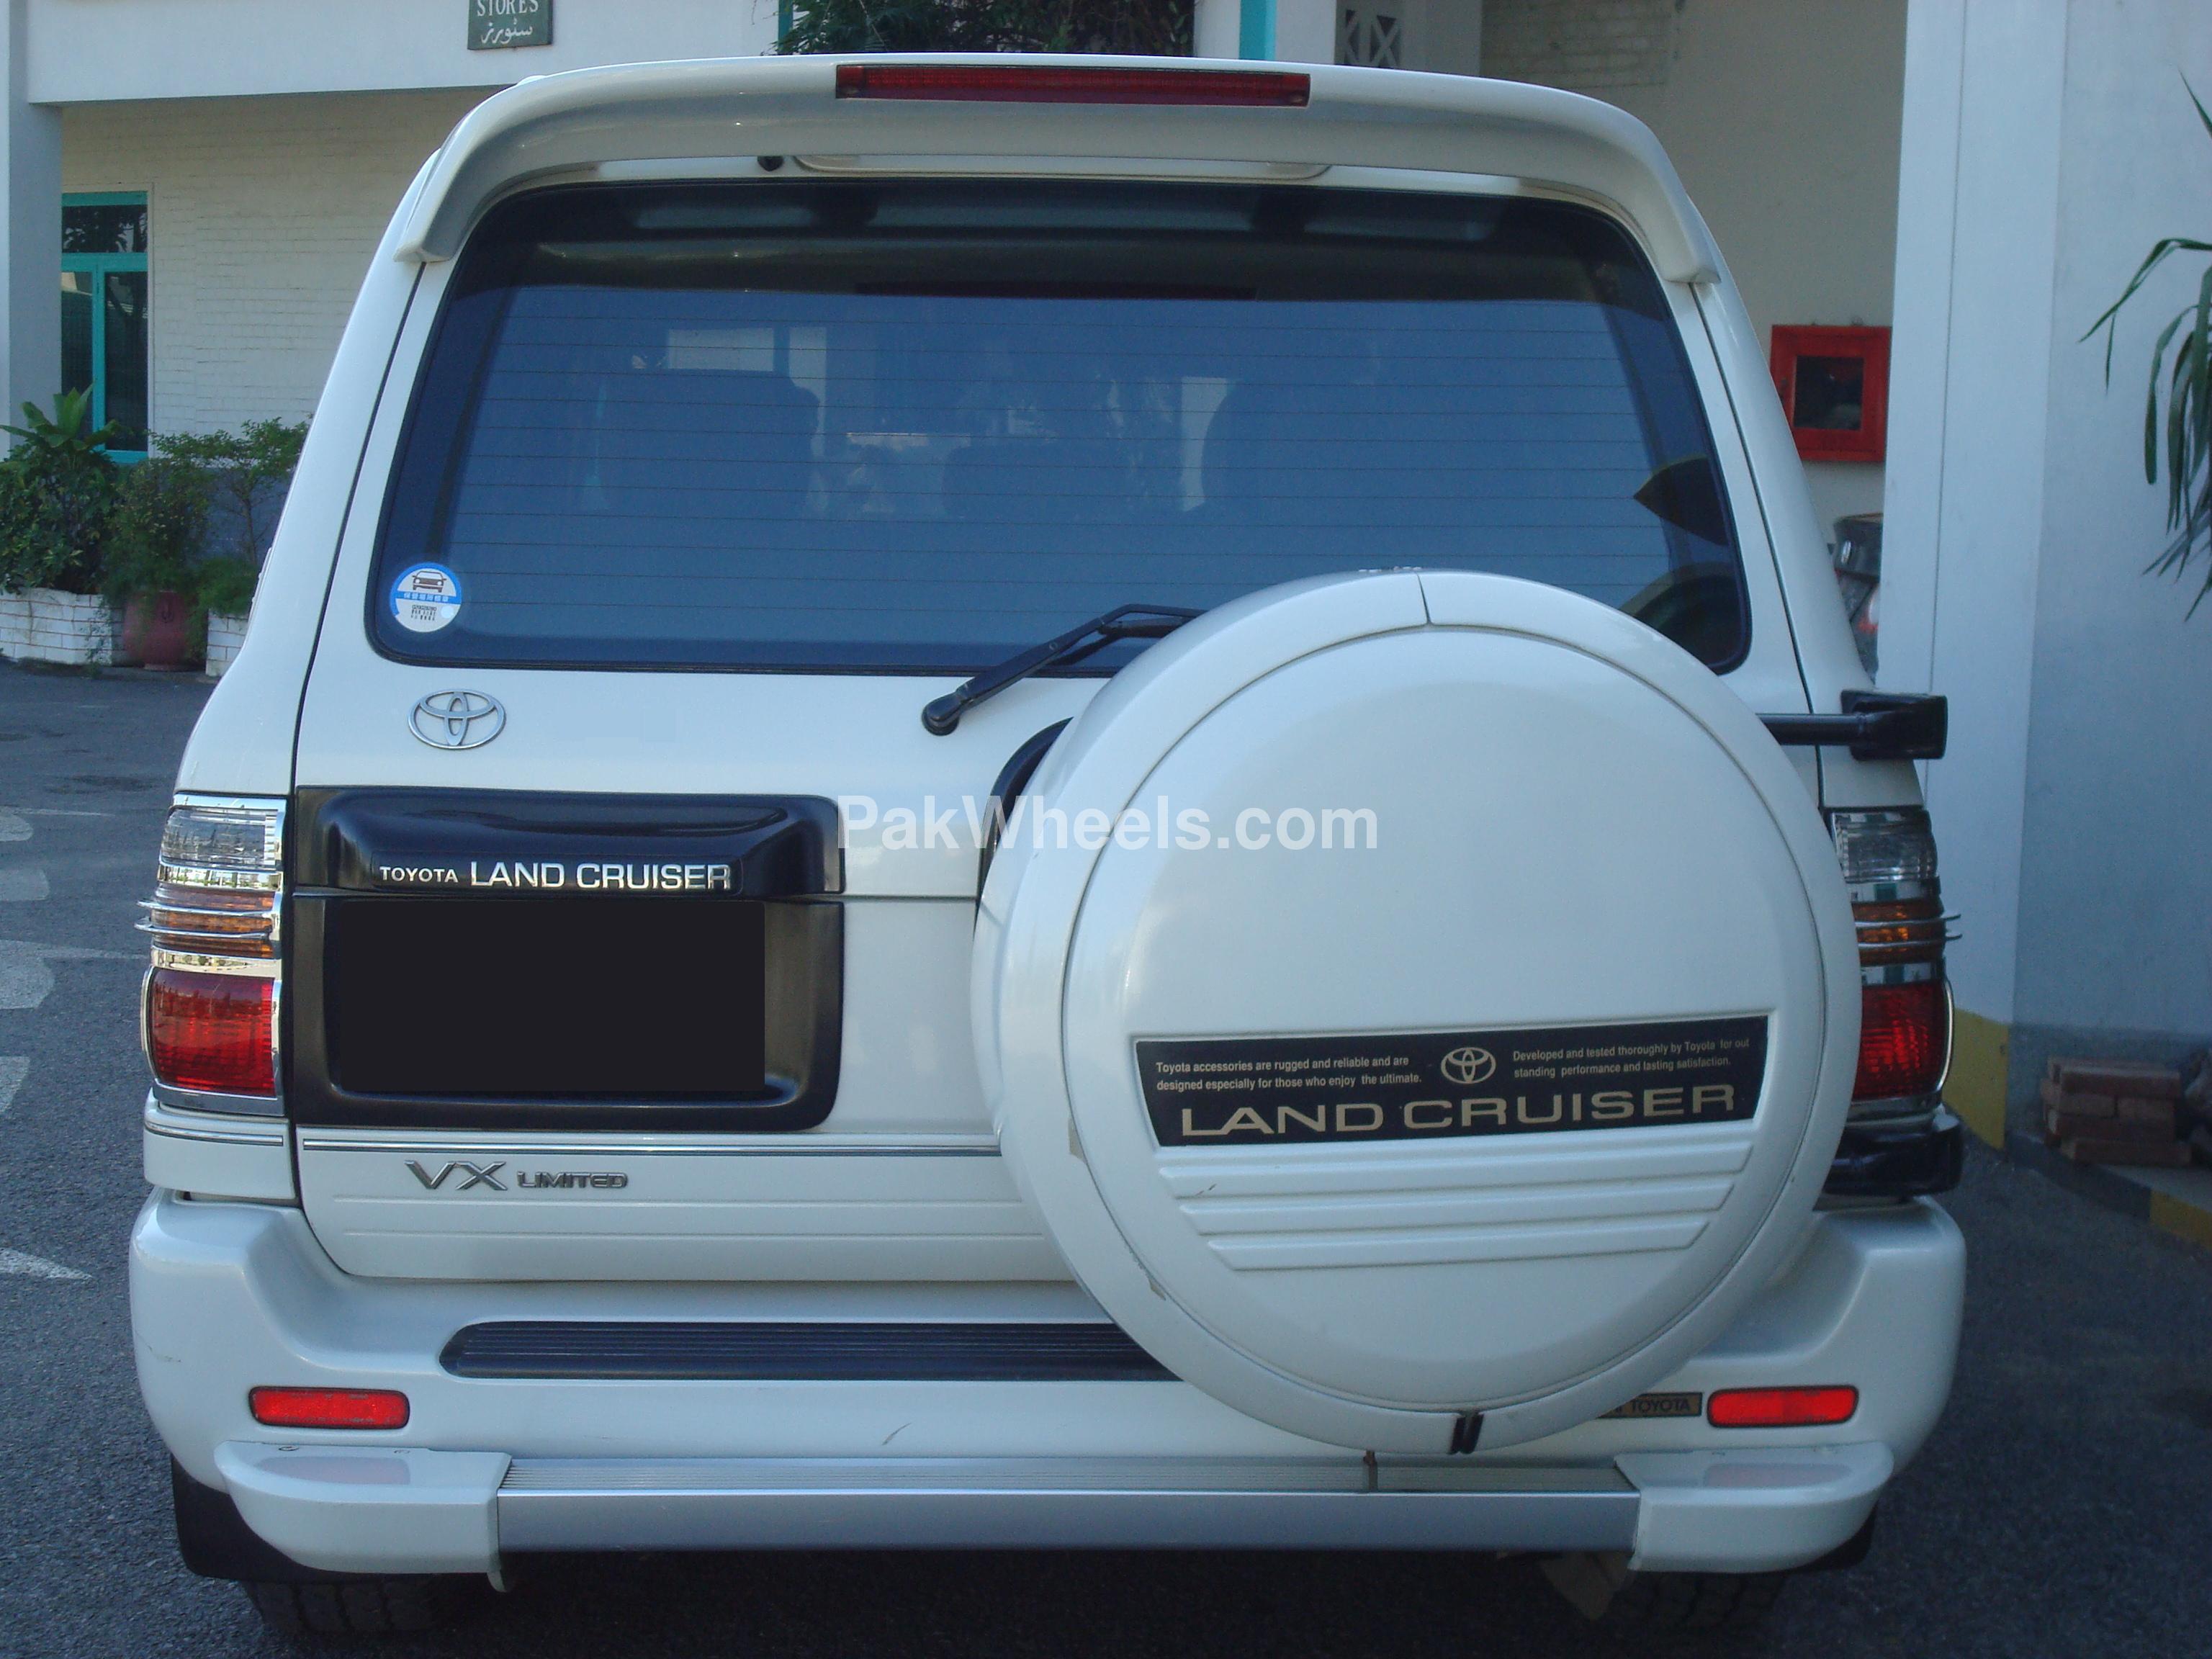 Toyota Land Cruiser 2002 Image-1